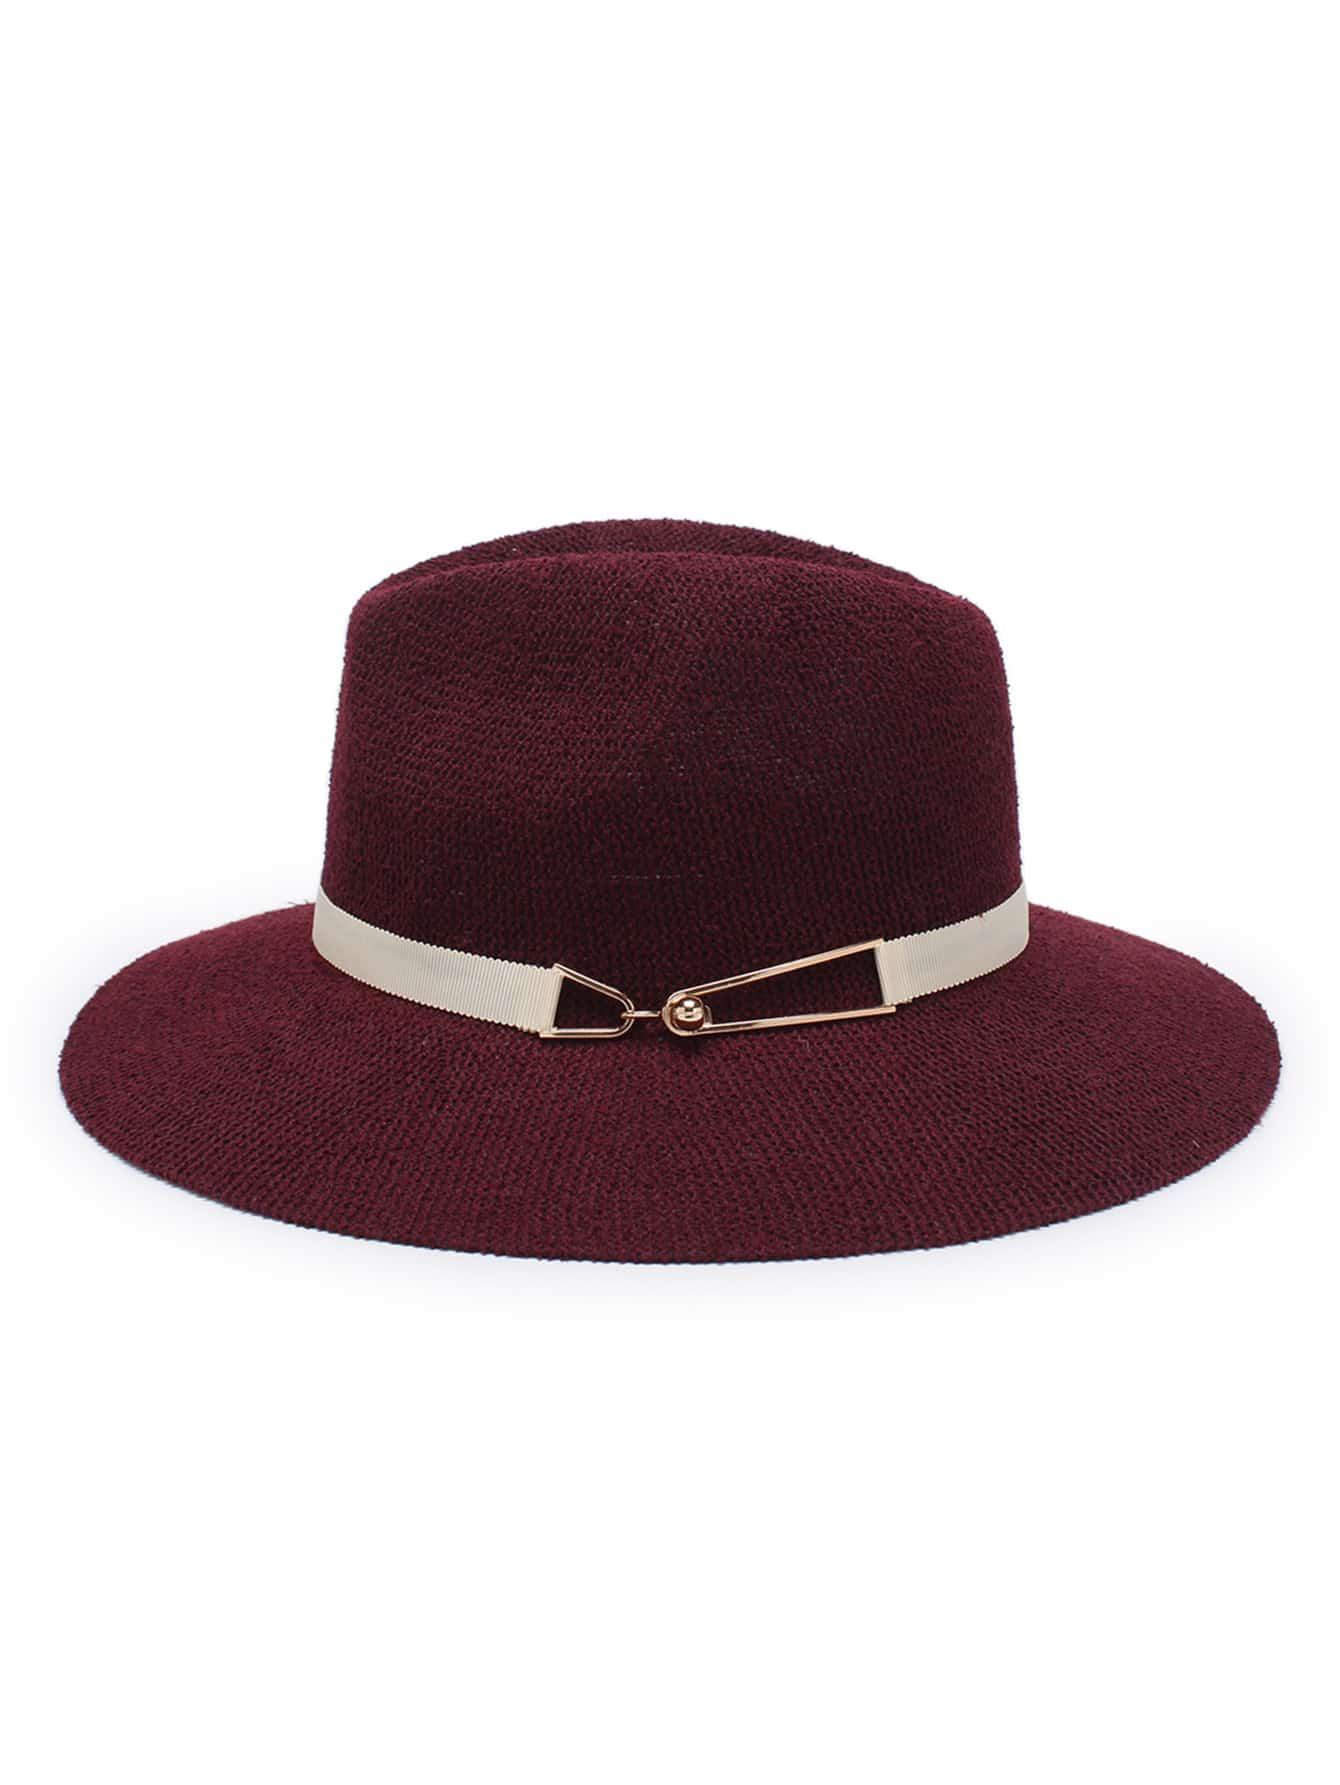 Contrast  Band Straw Fedora Hat straw fedora hat